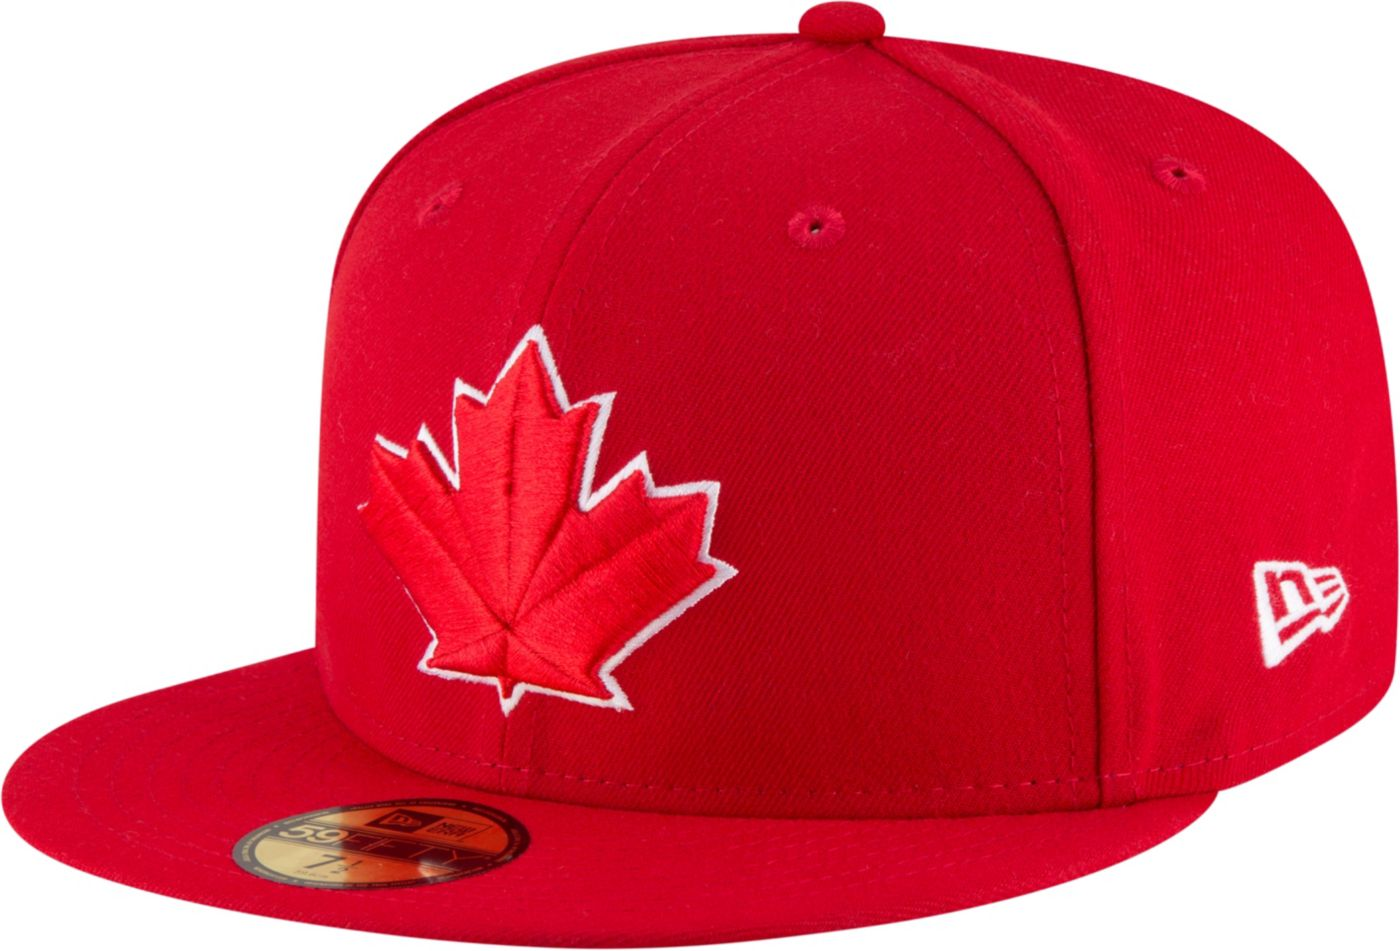 New Era Men's Toronto Blue Jays 59Fifty Alternate Red Authentic Hat